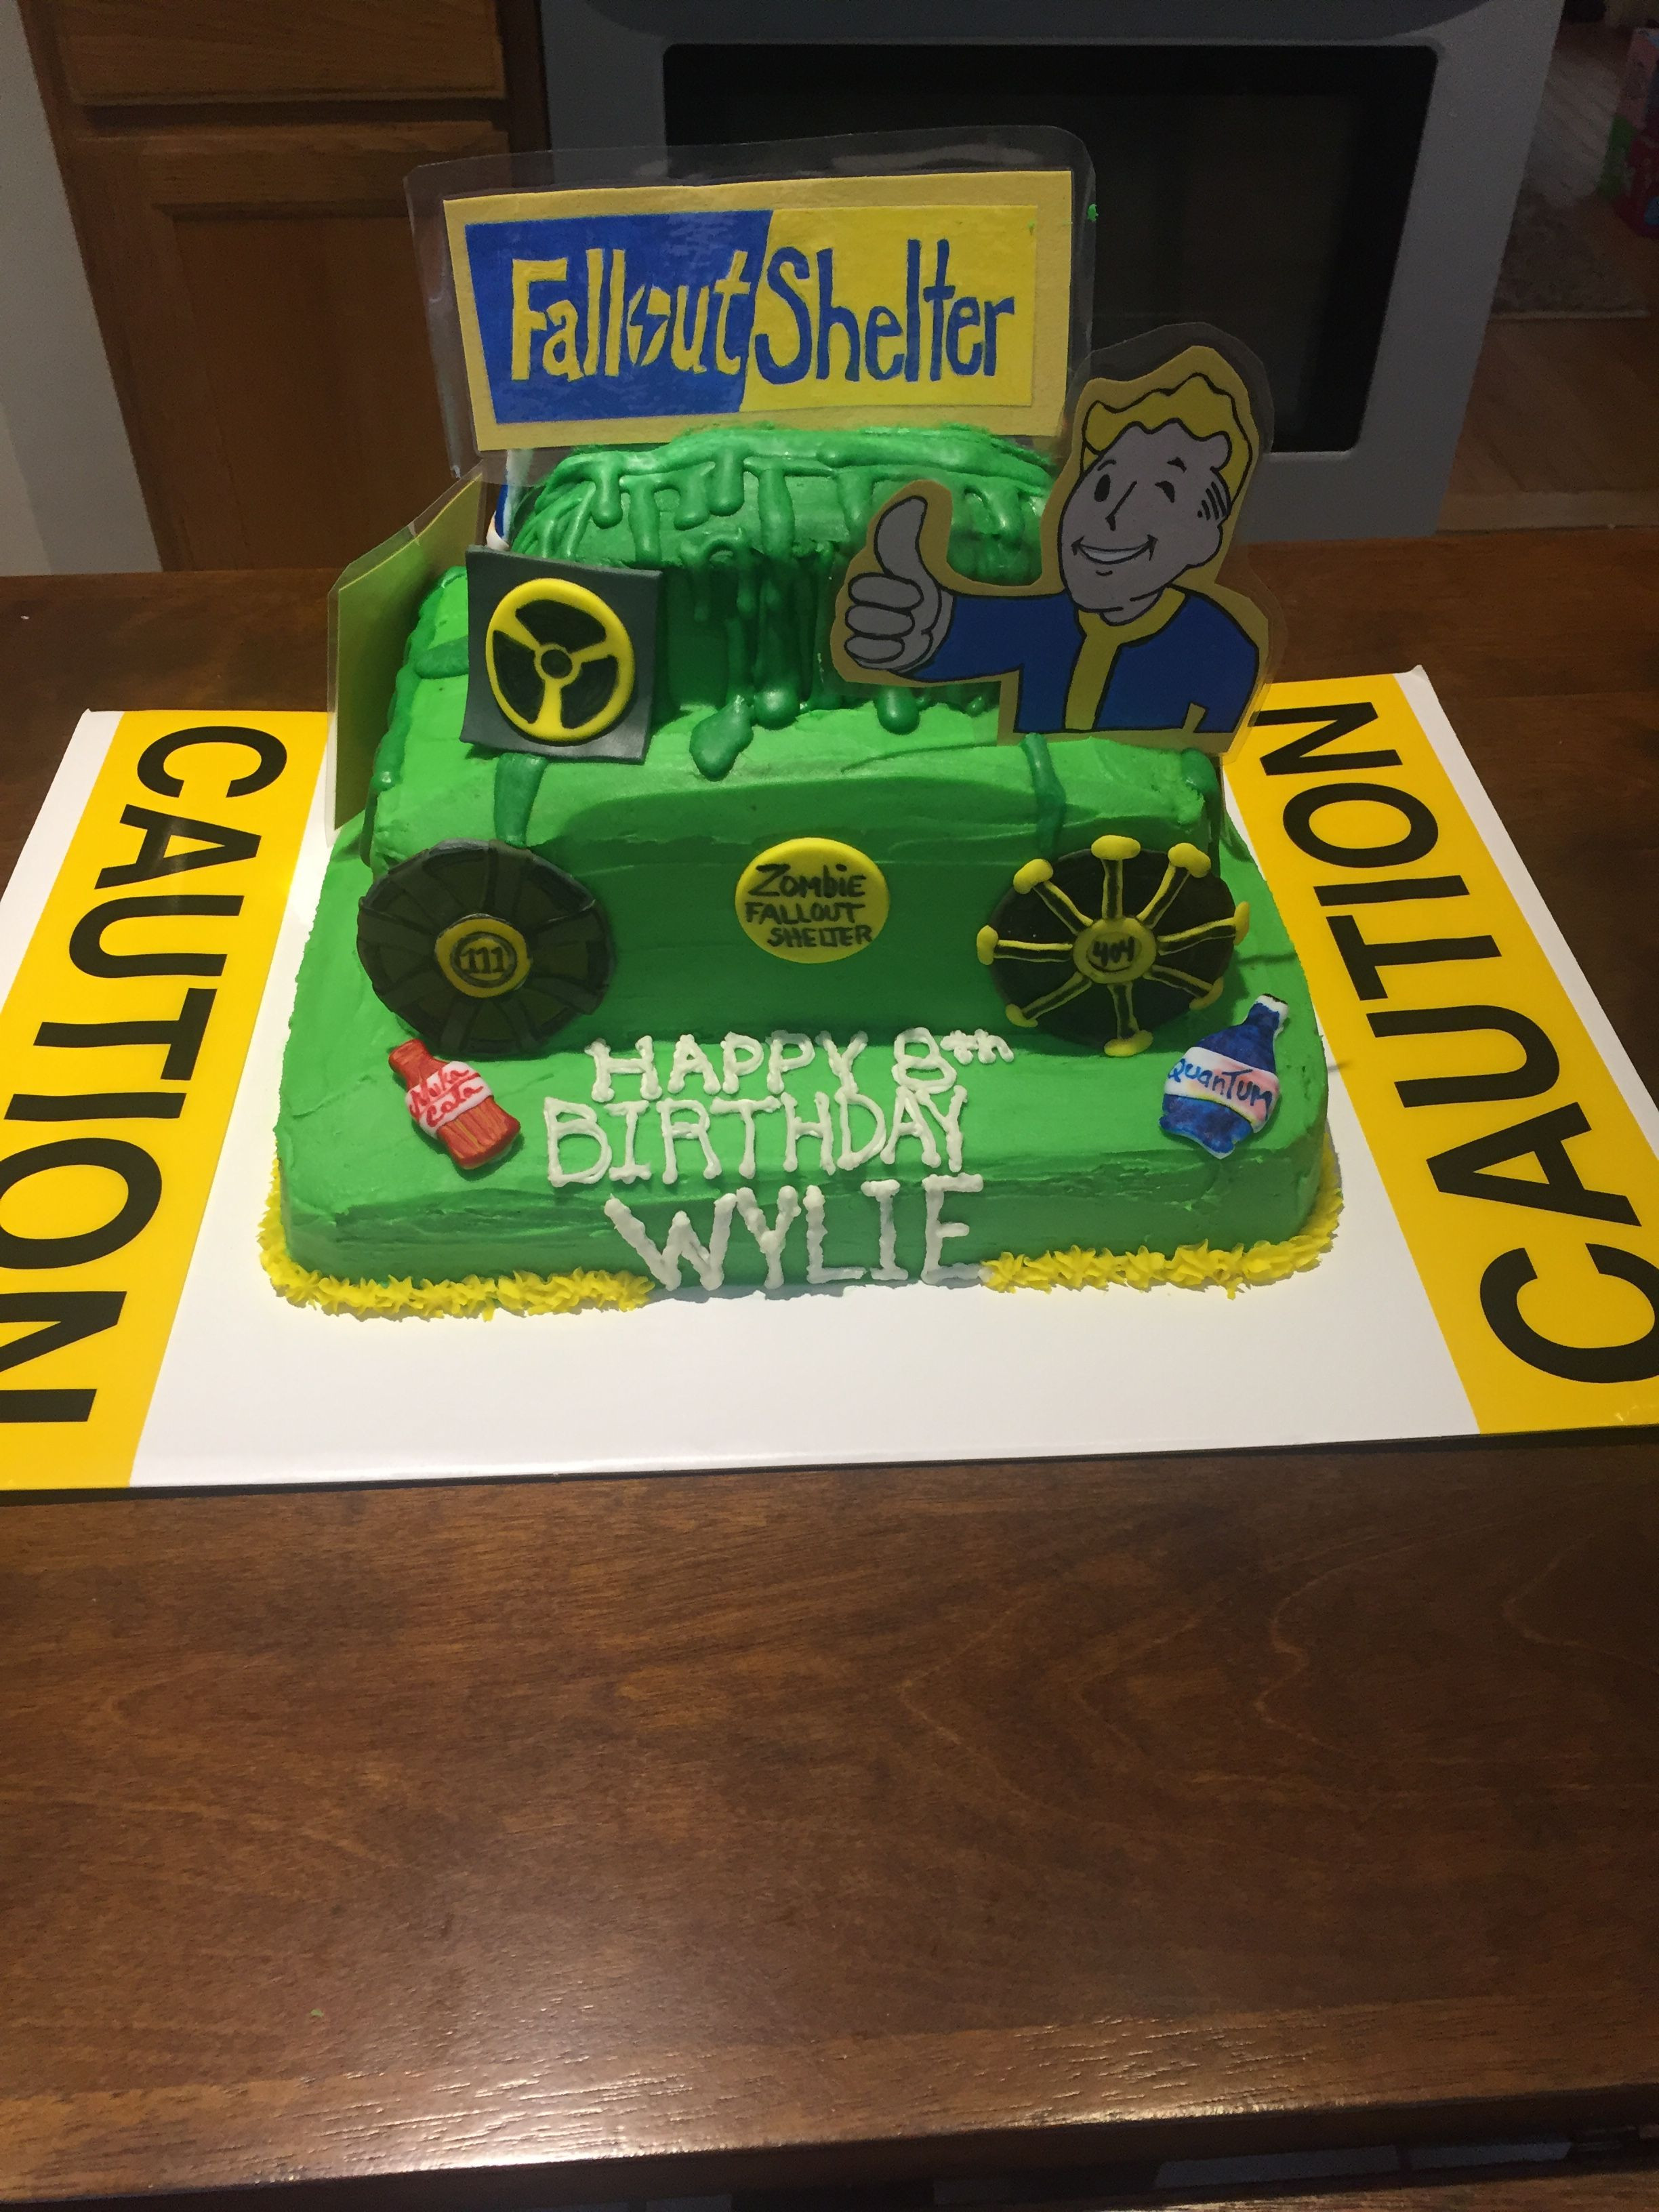 Fallout Birthday Cake  Fallout Shelter Birthday cake